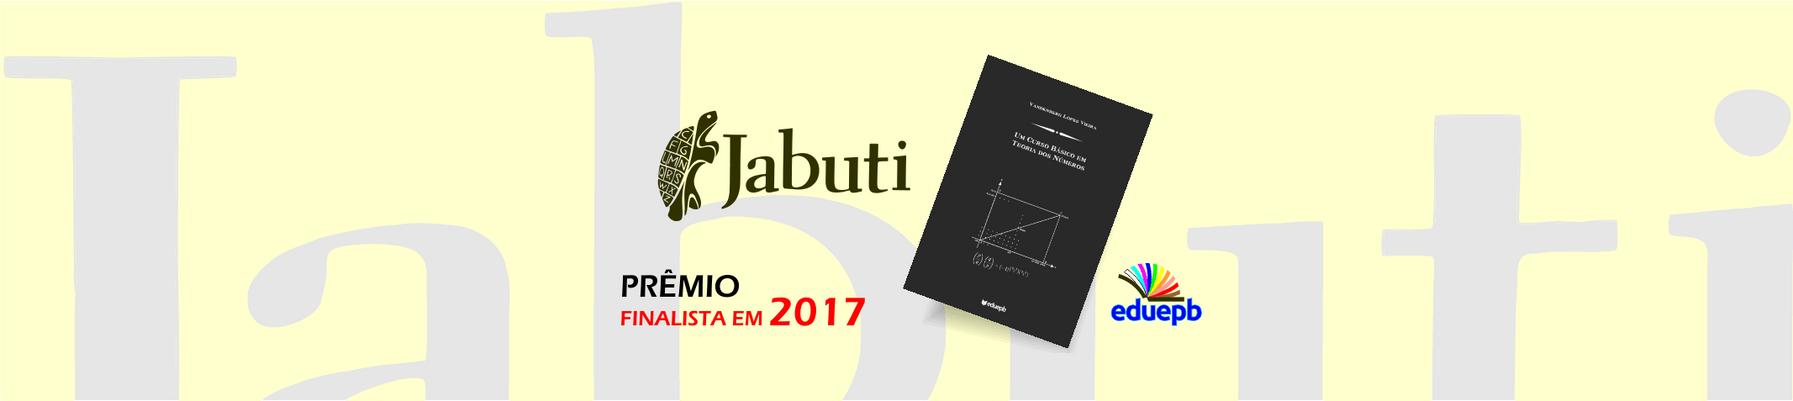 JABUTI 5.png